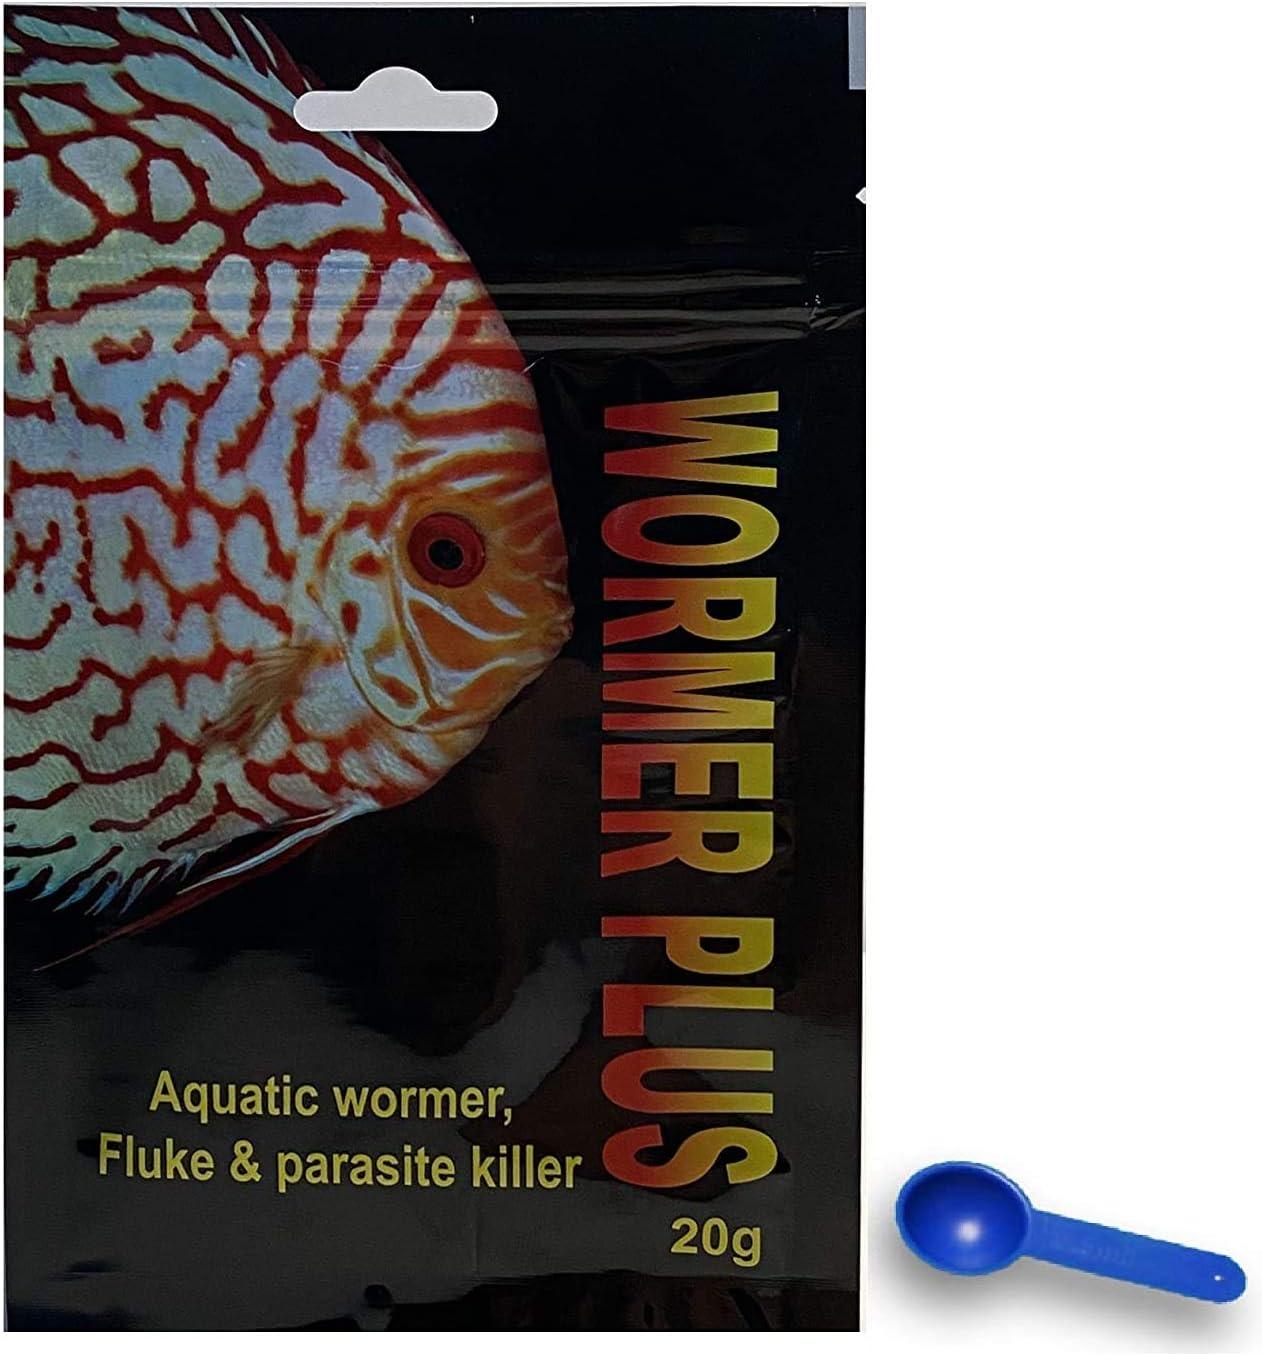 Wormer Plus - Anti-Parasitic Fish Medication - Flubendazole for Fish with parasites and Flukes